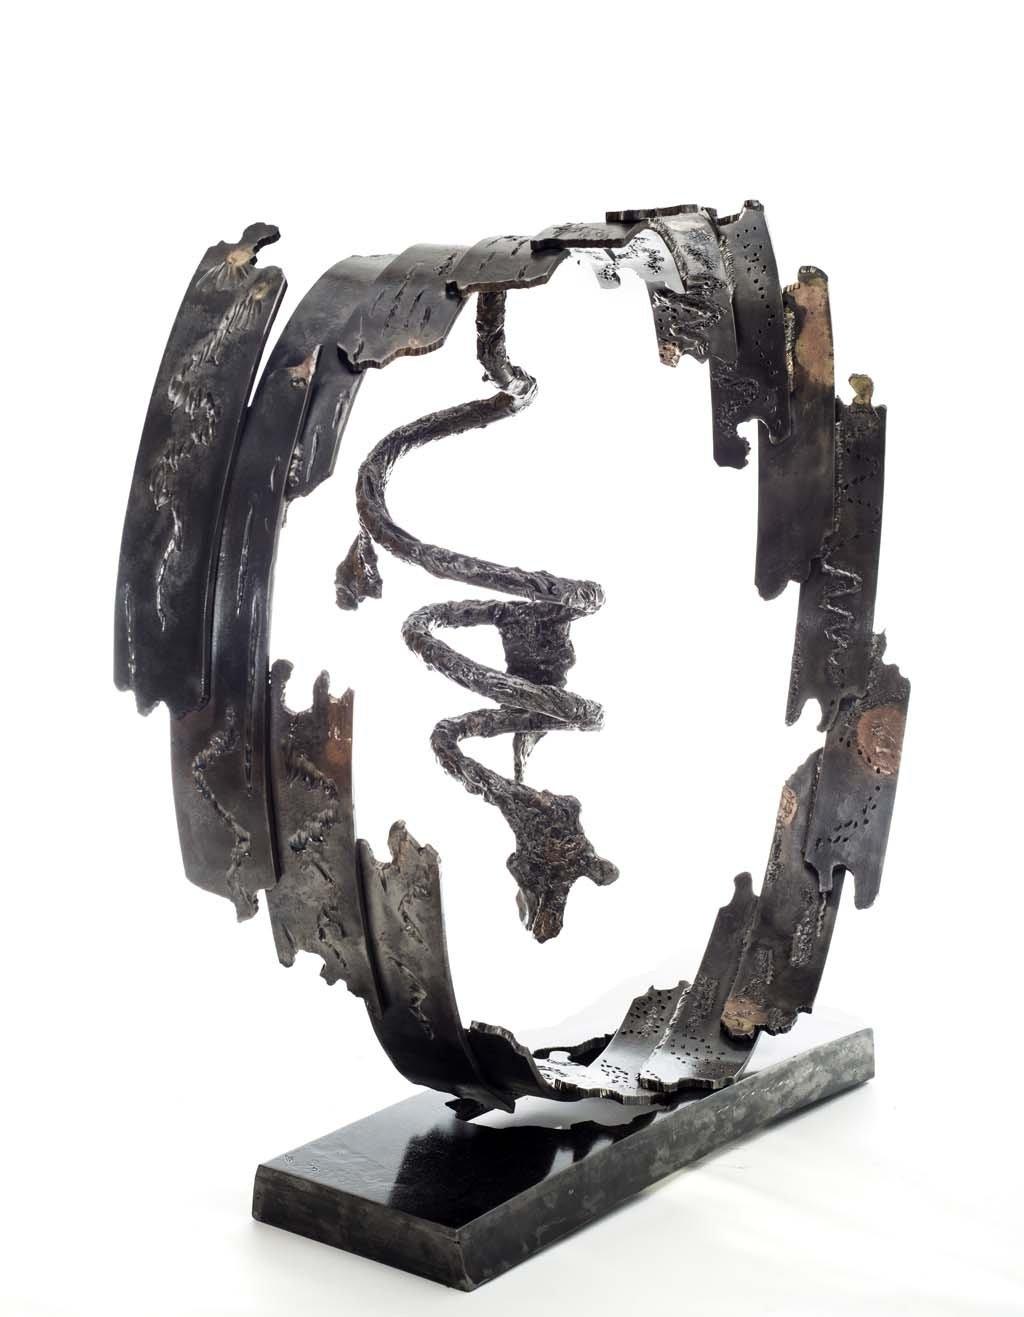 Insights VII | 2014 | Iron & brass sculpture of the Israeli artist, sculptor Rami Ater